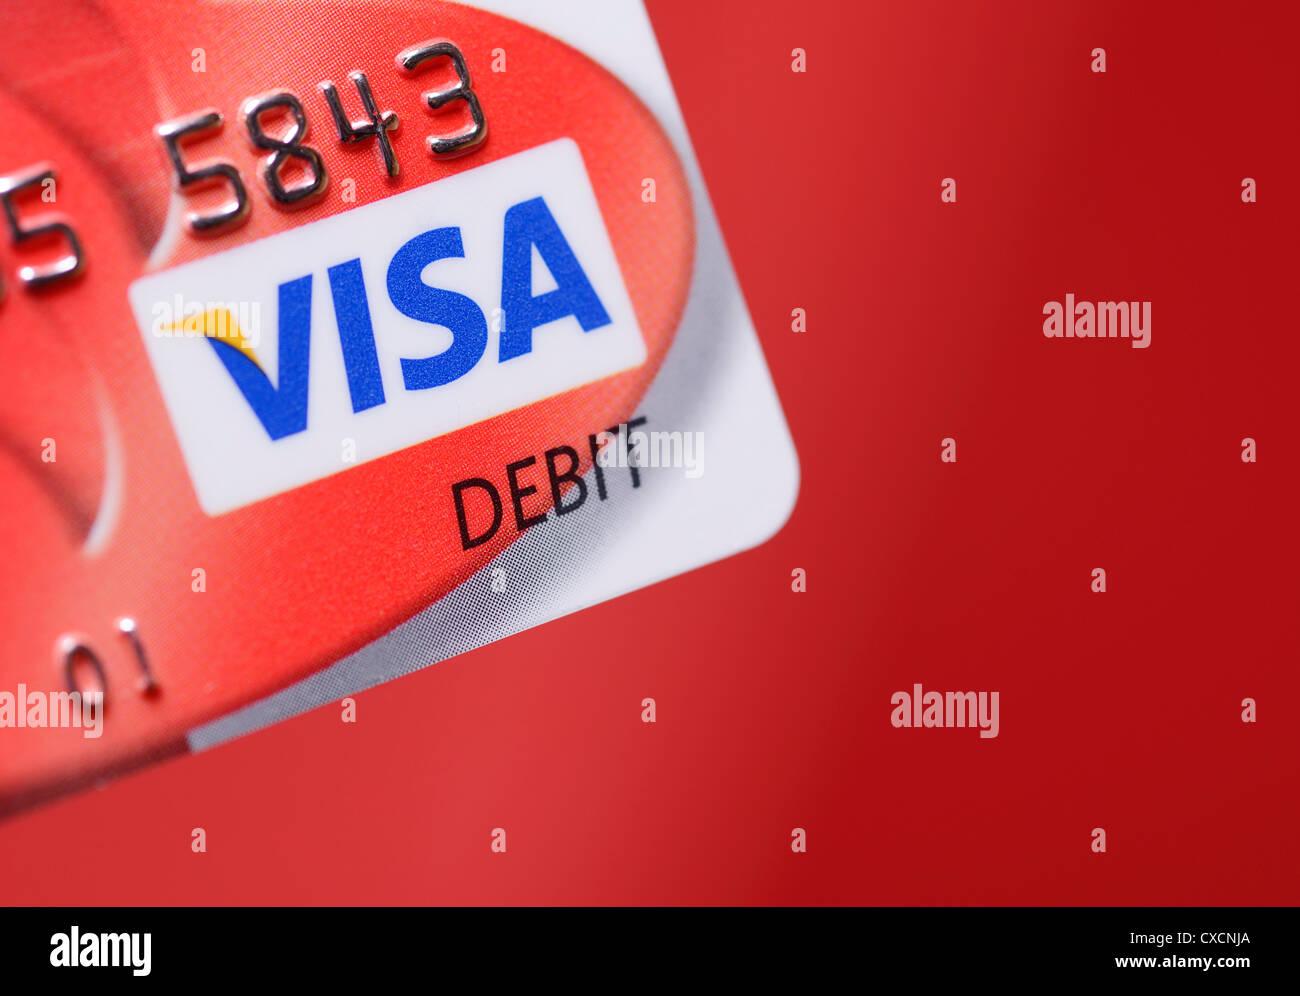 debit card photos amp debit card images alamy